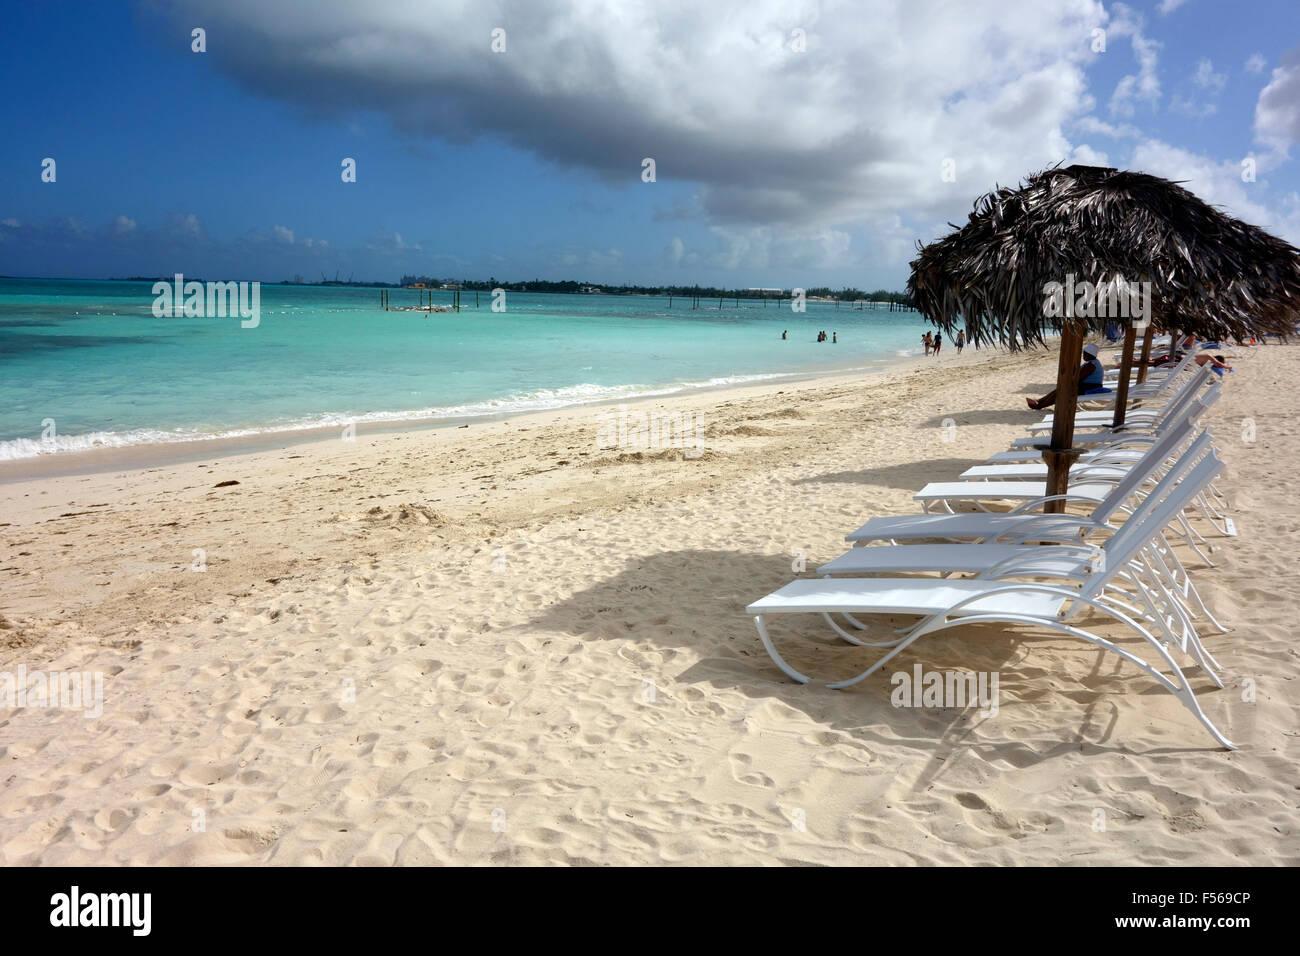 Cable Beach, Nassau, Bahamas, Caribbean - Stock Image